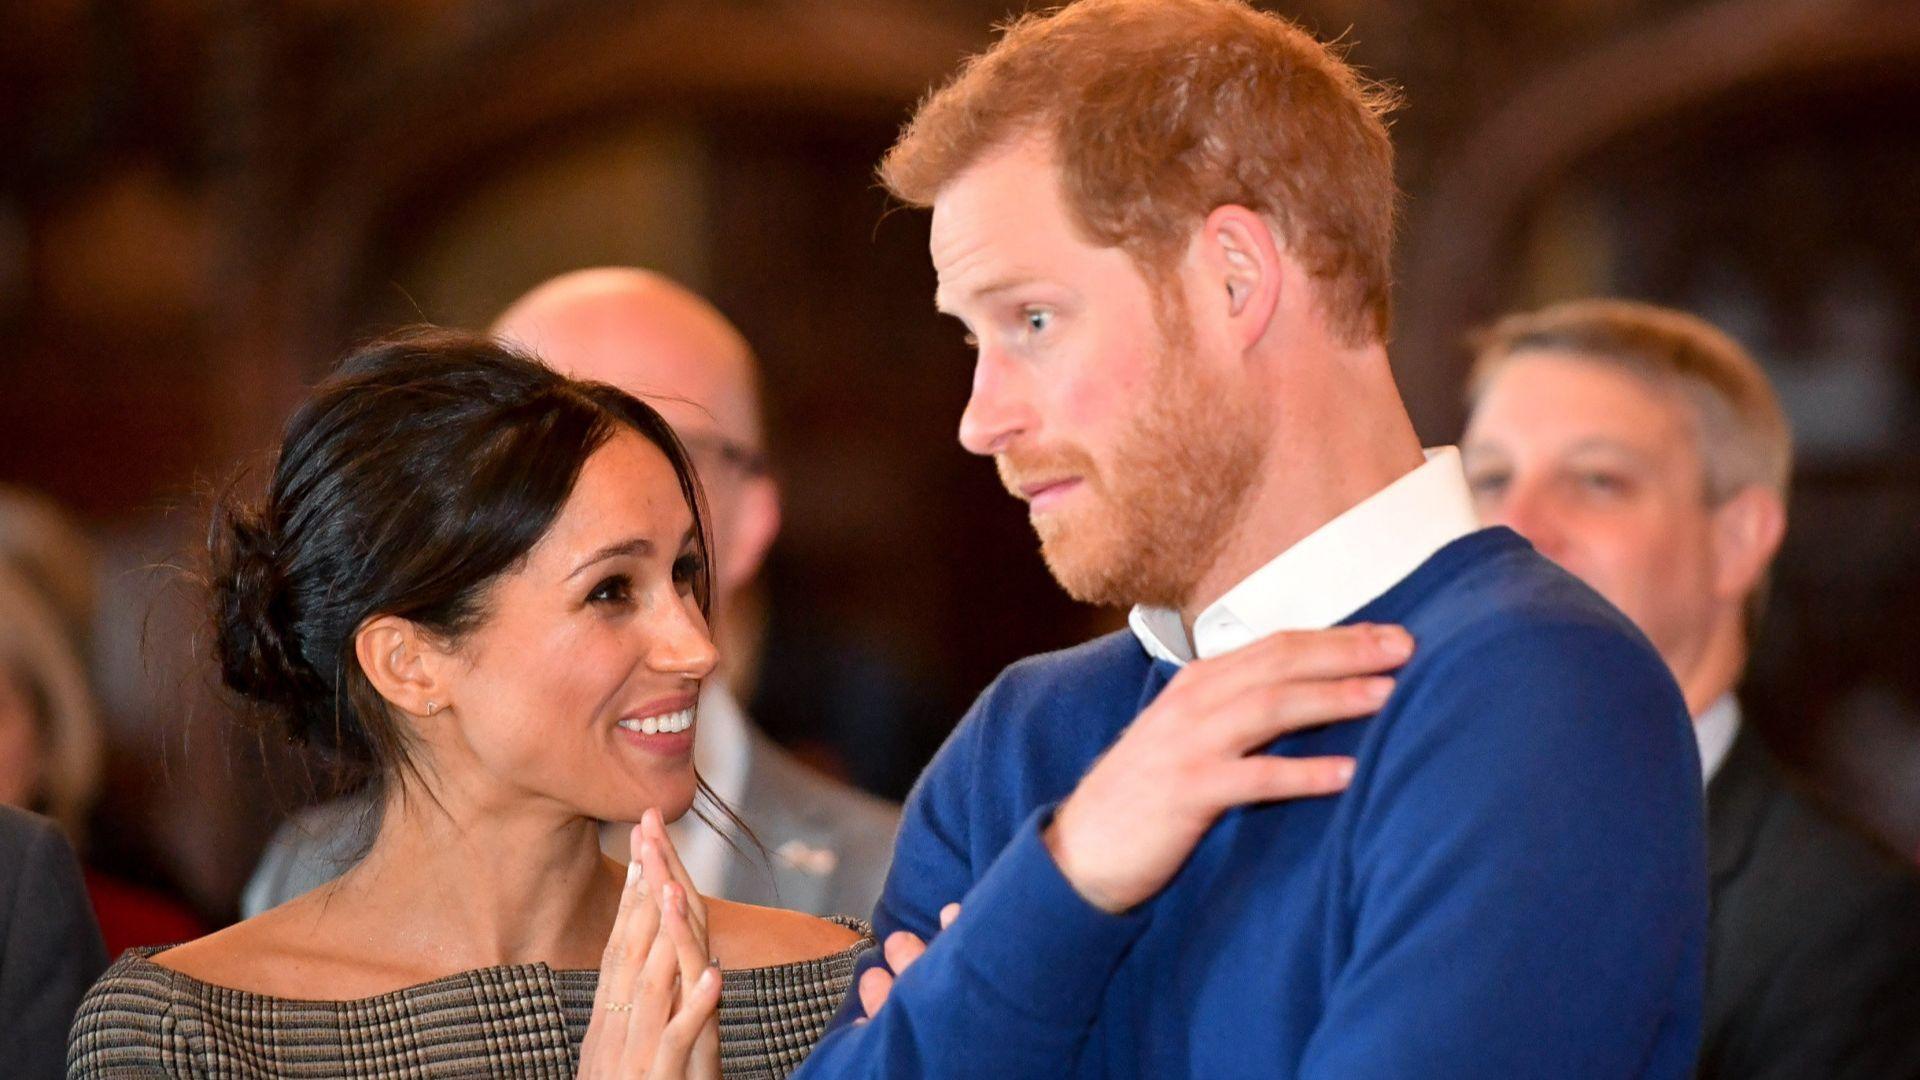 След Меган и принц Хари заведе дело срещу британски вестник за клевета